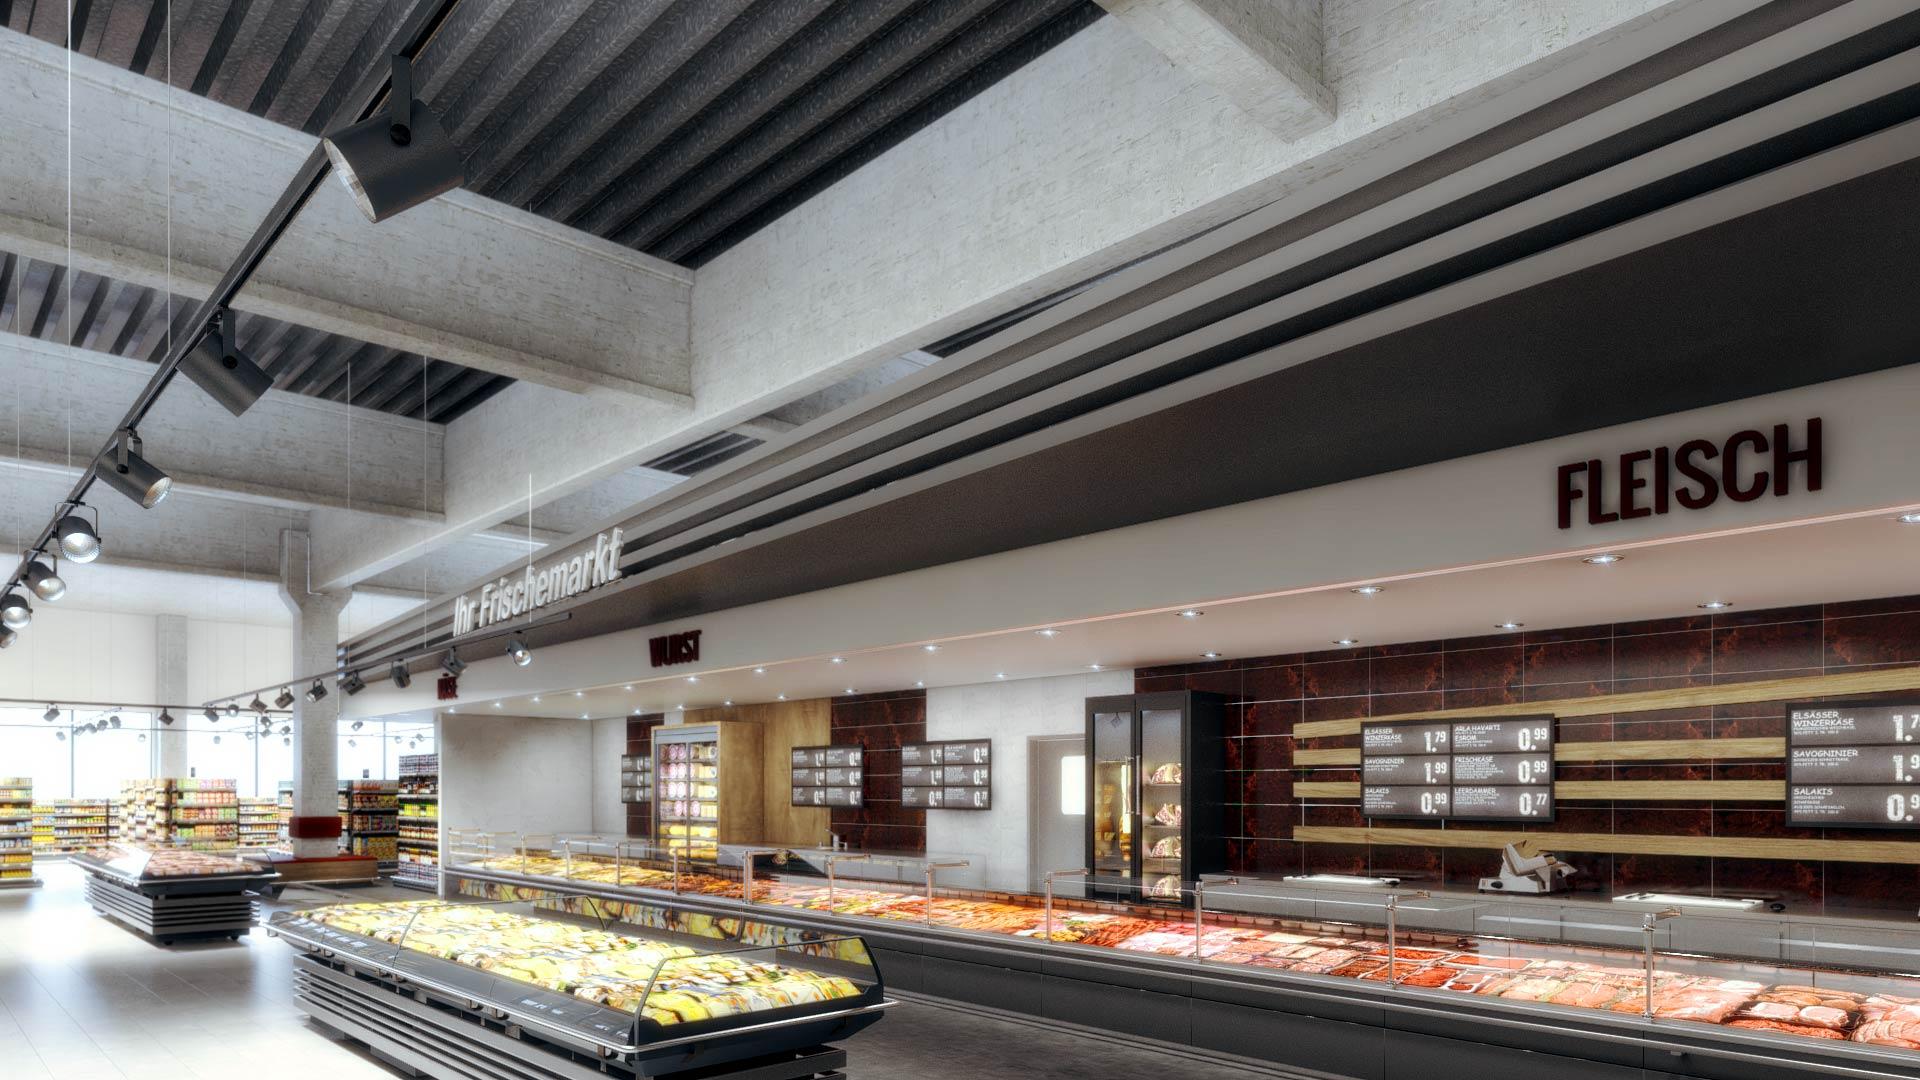 Interior_Design_3D_Architekturvisualisierung_EDEKA_Iserlohn_Wurst_Lebensmittelhandel EDEKA Iserlohn Innenarchitektur